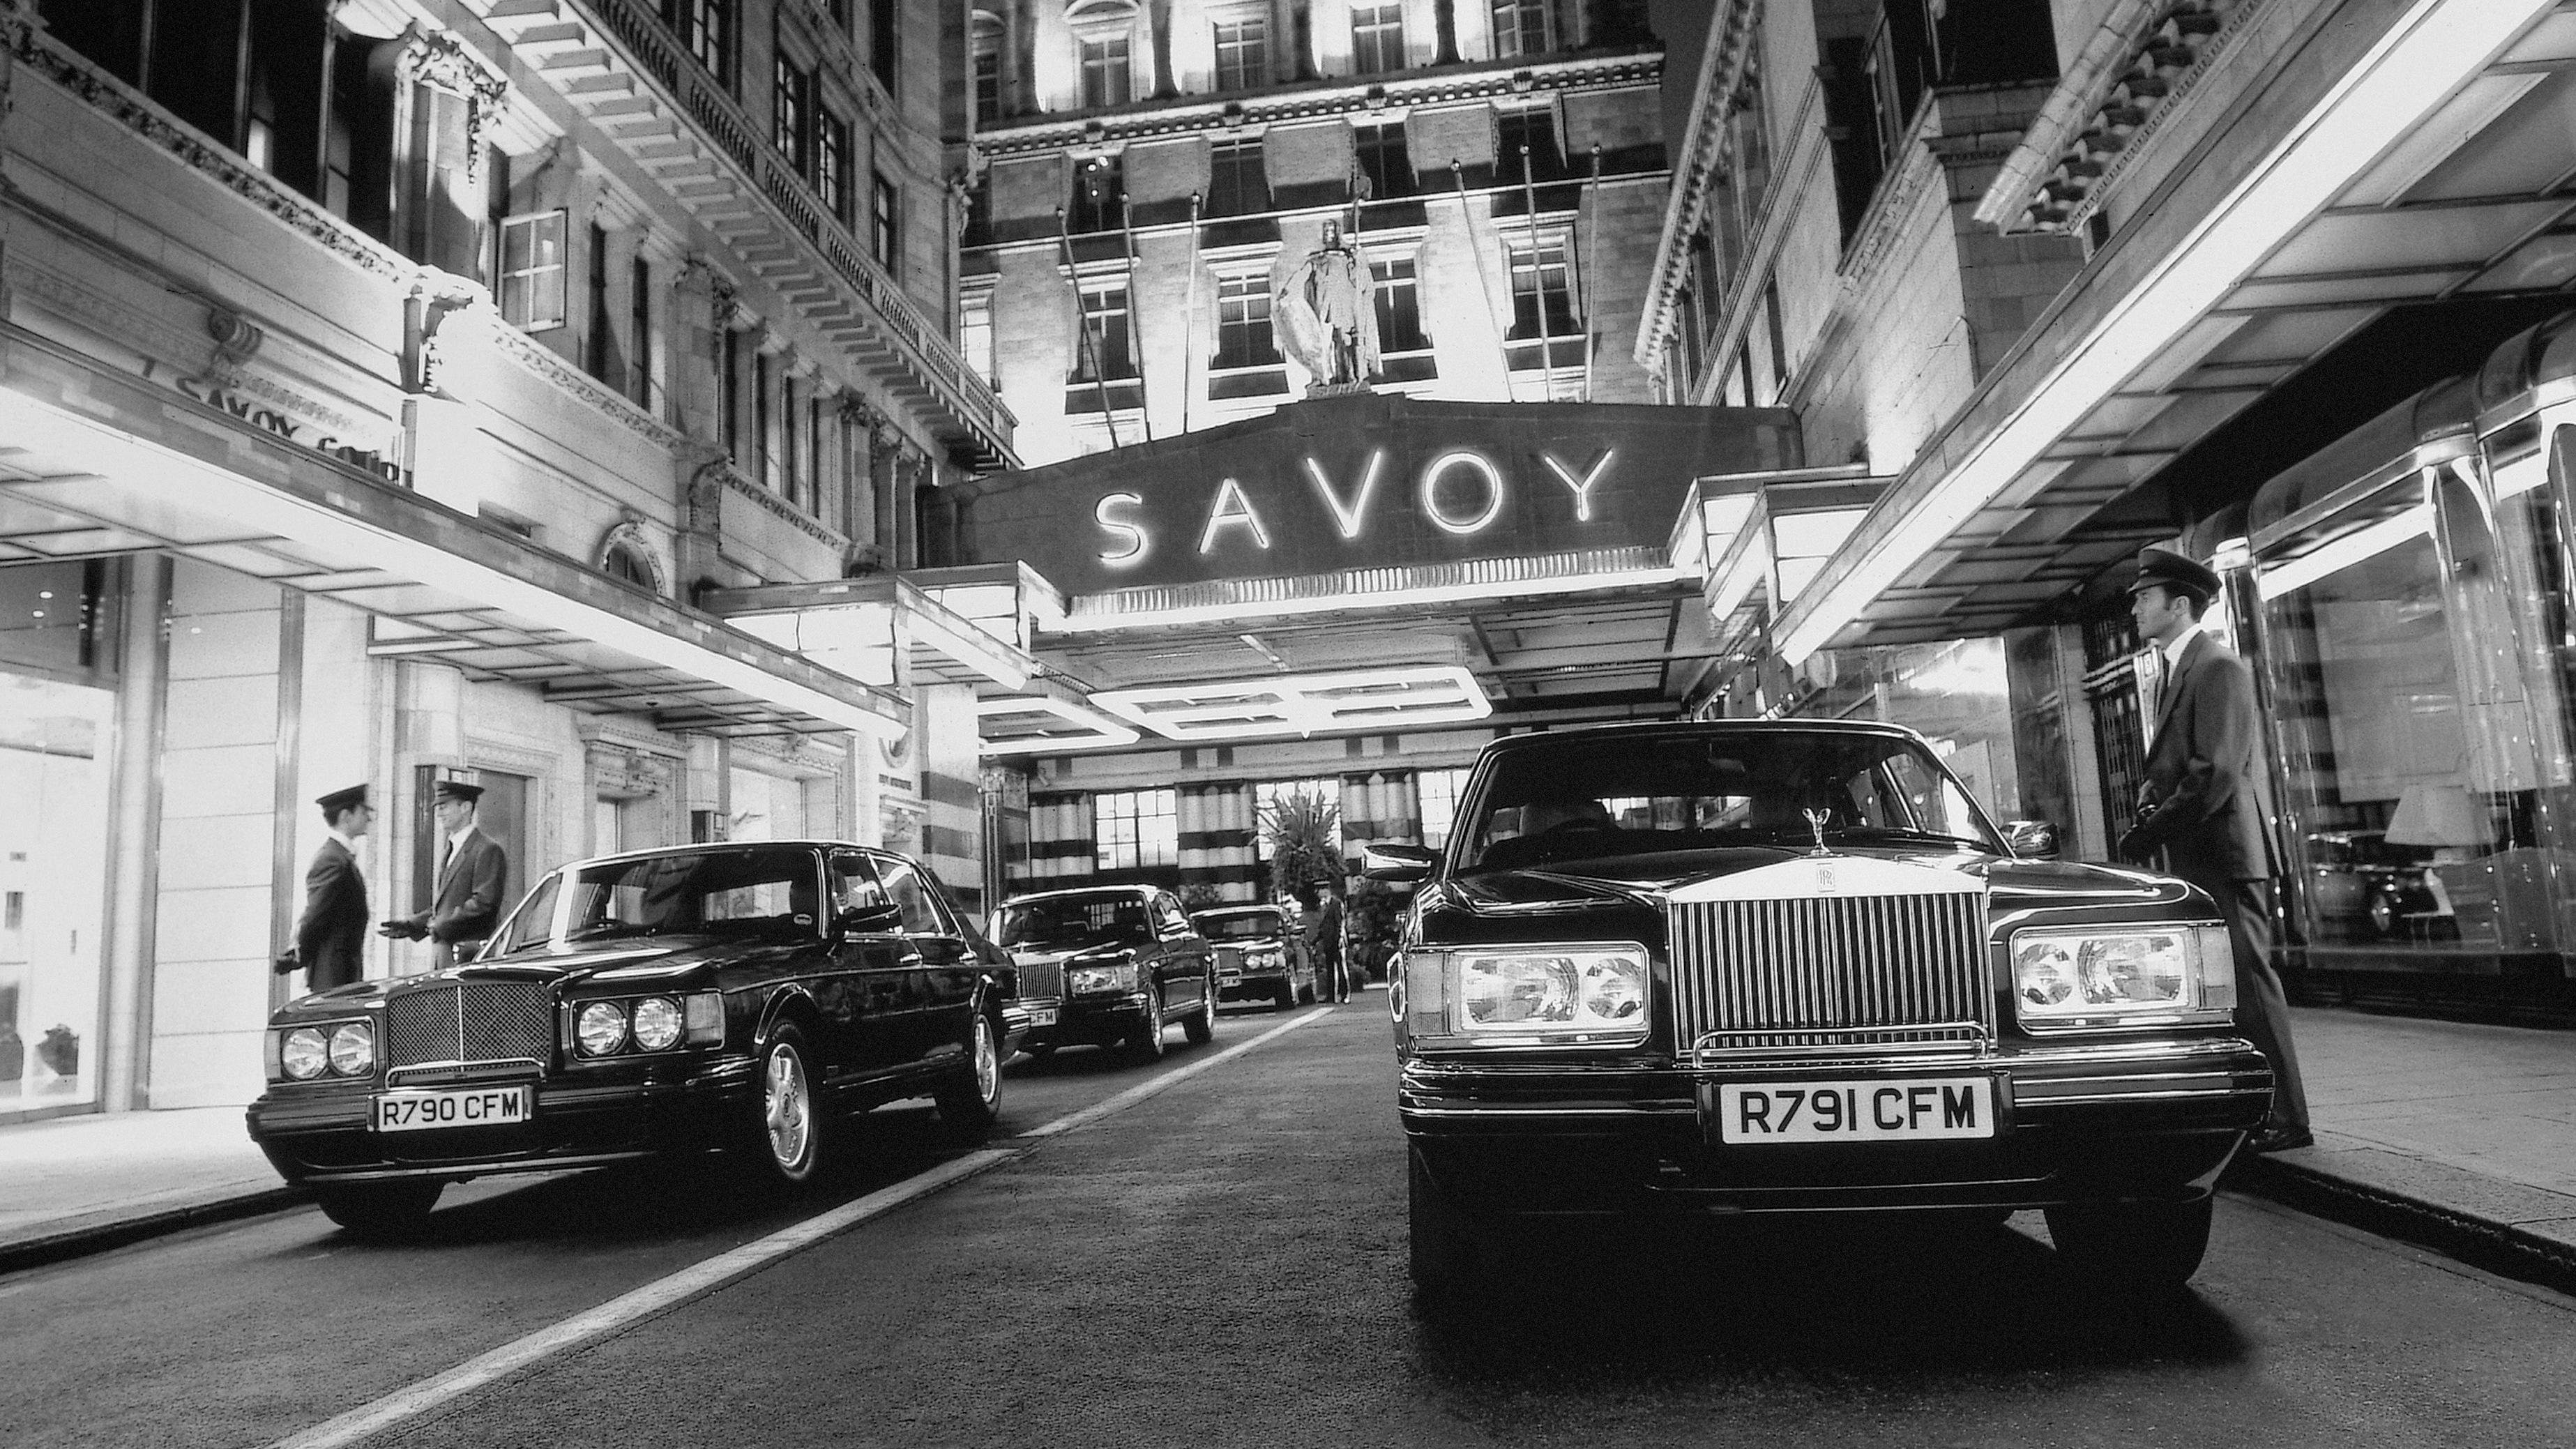 Savoy at night rgb.jpg